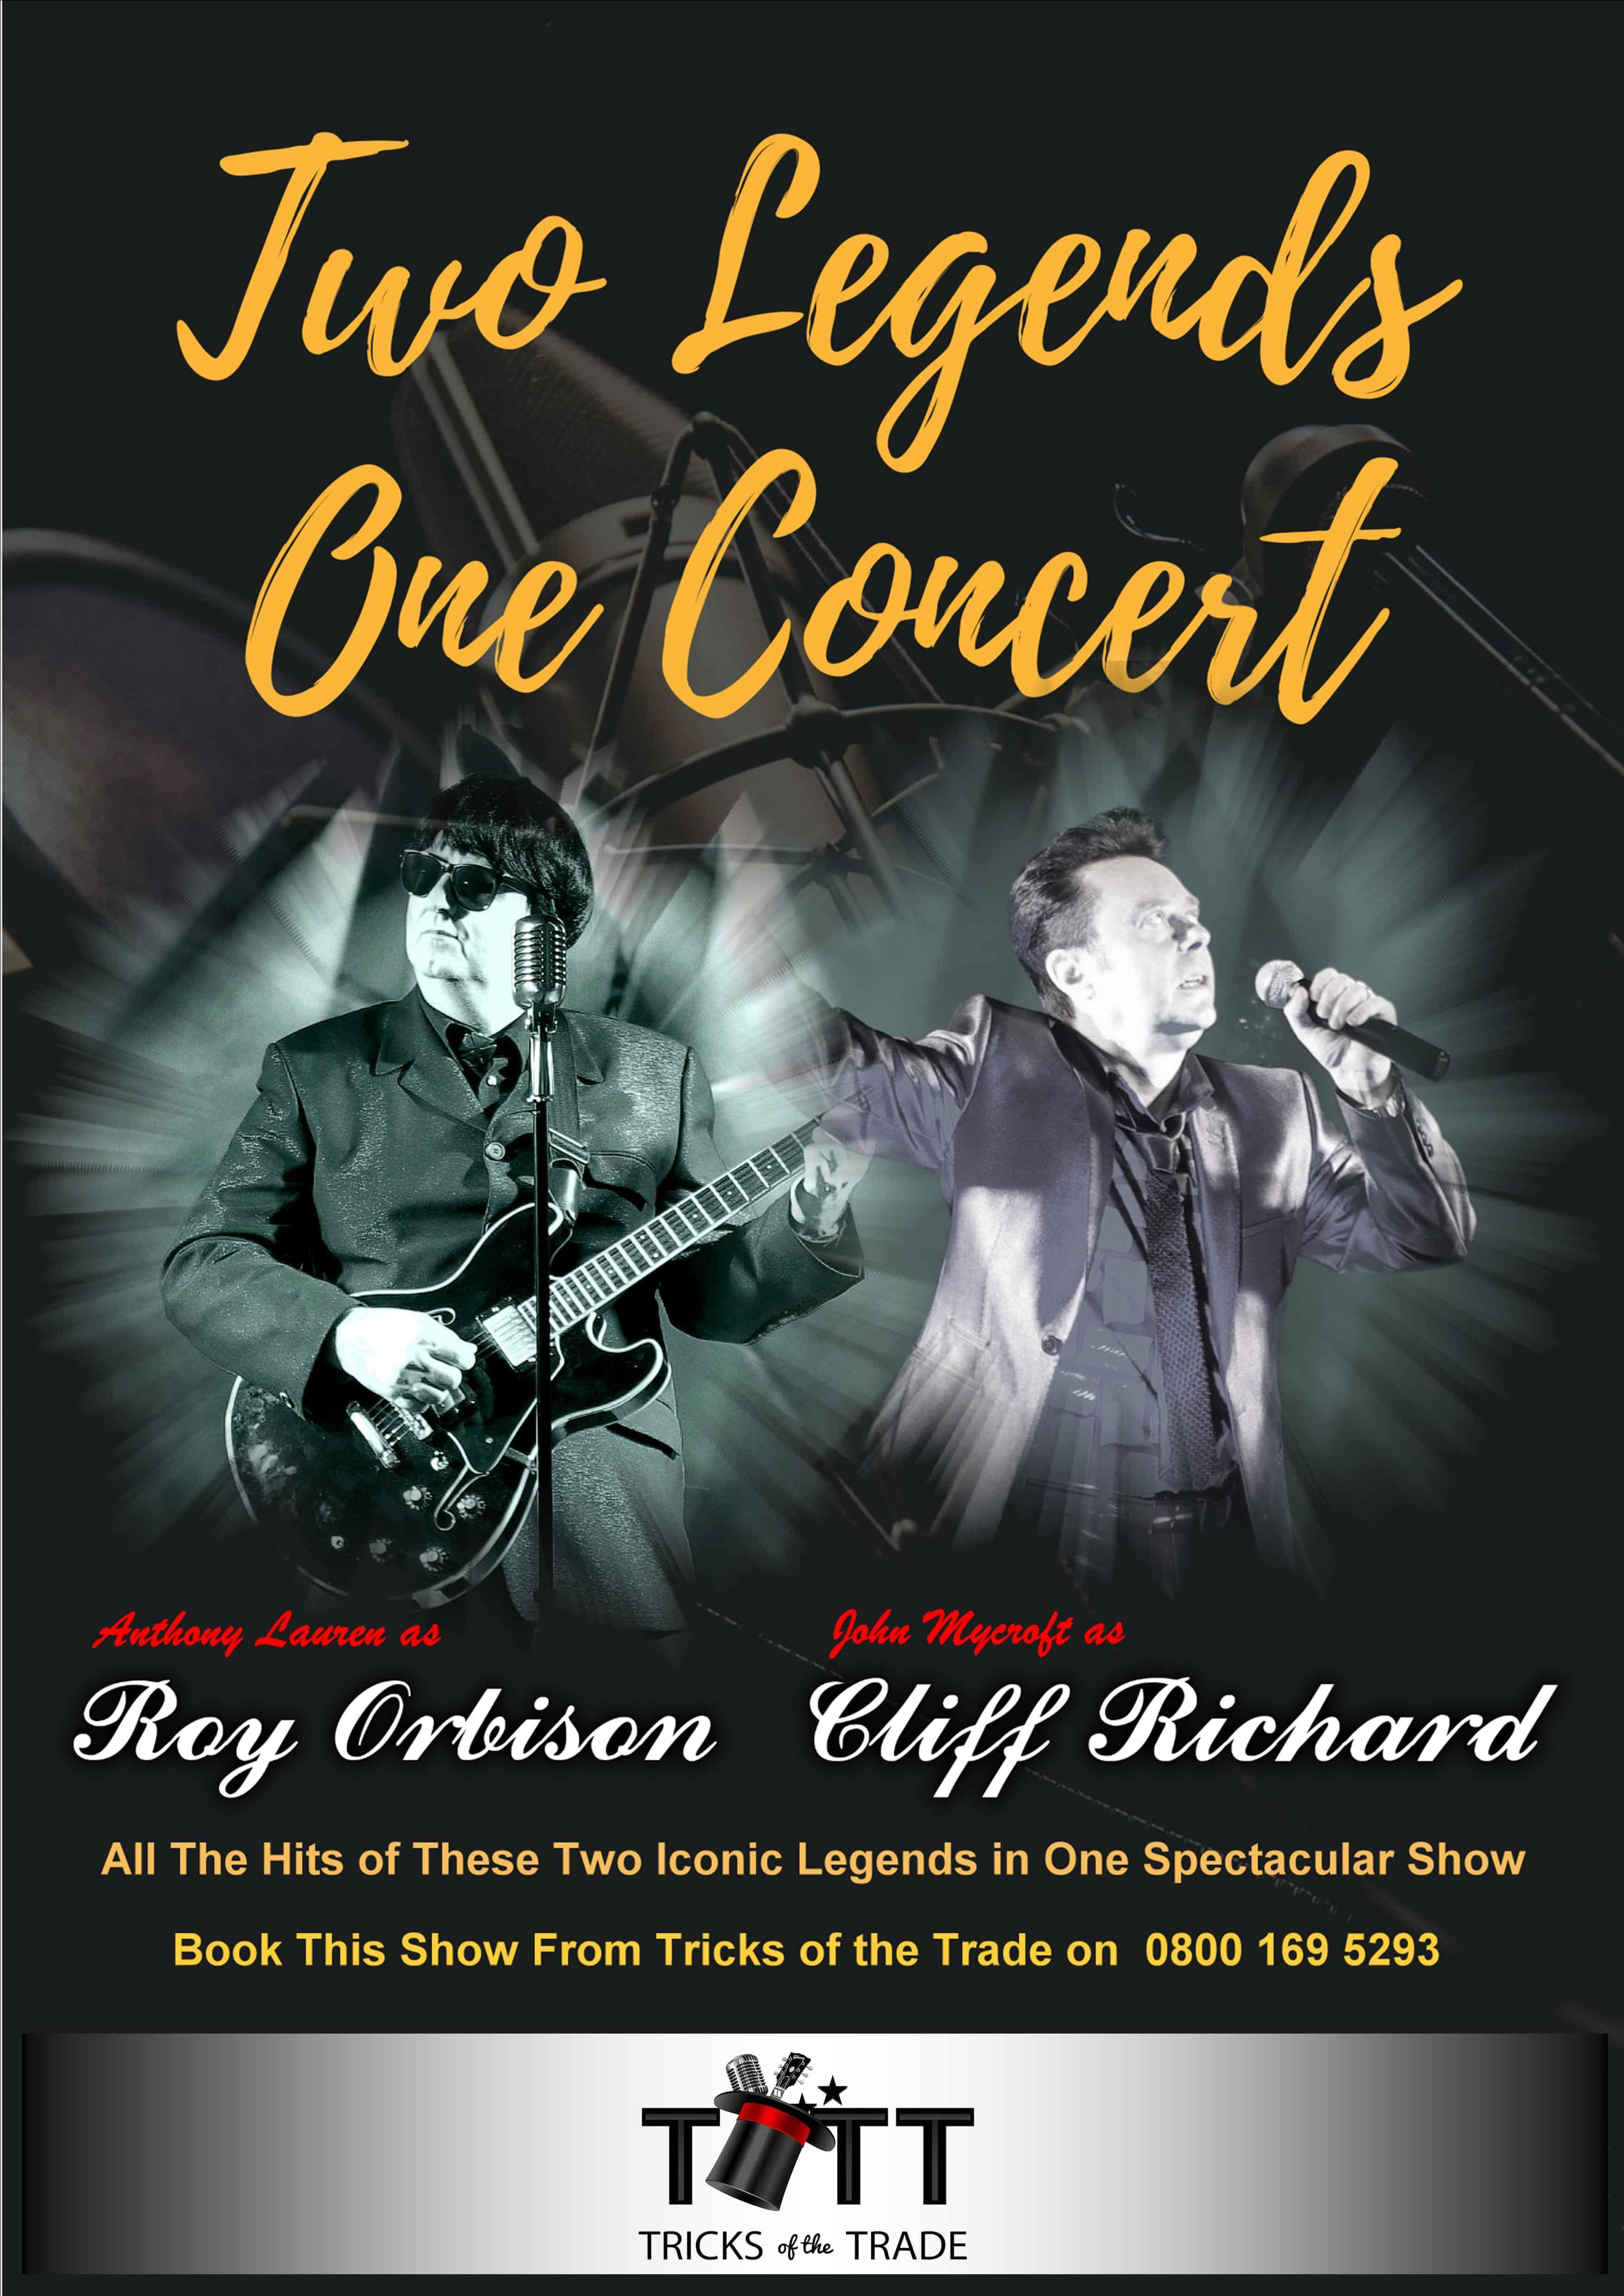 Roy Orbison & Cliff Richard Concert